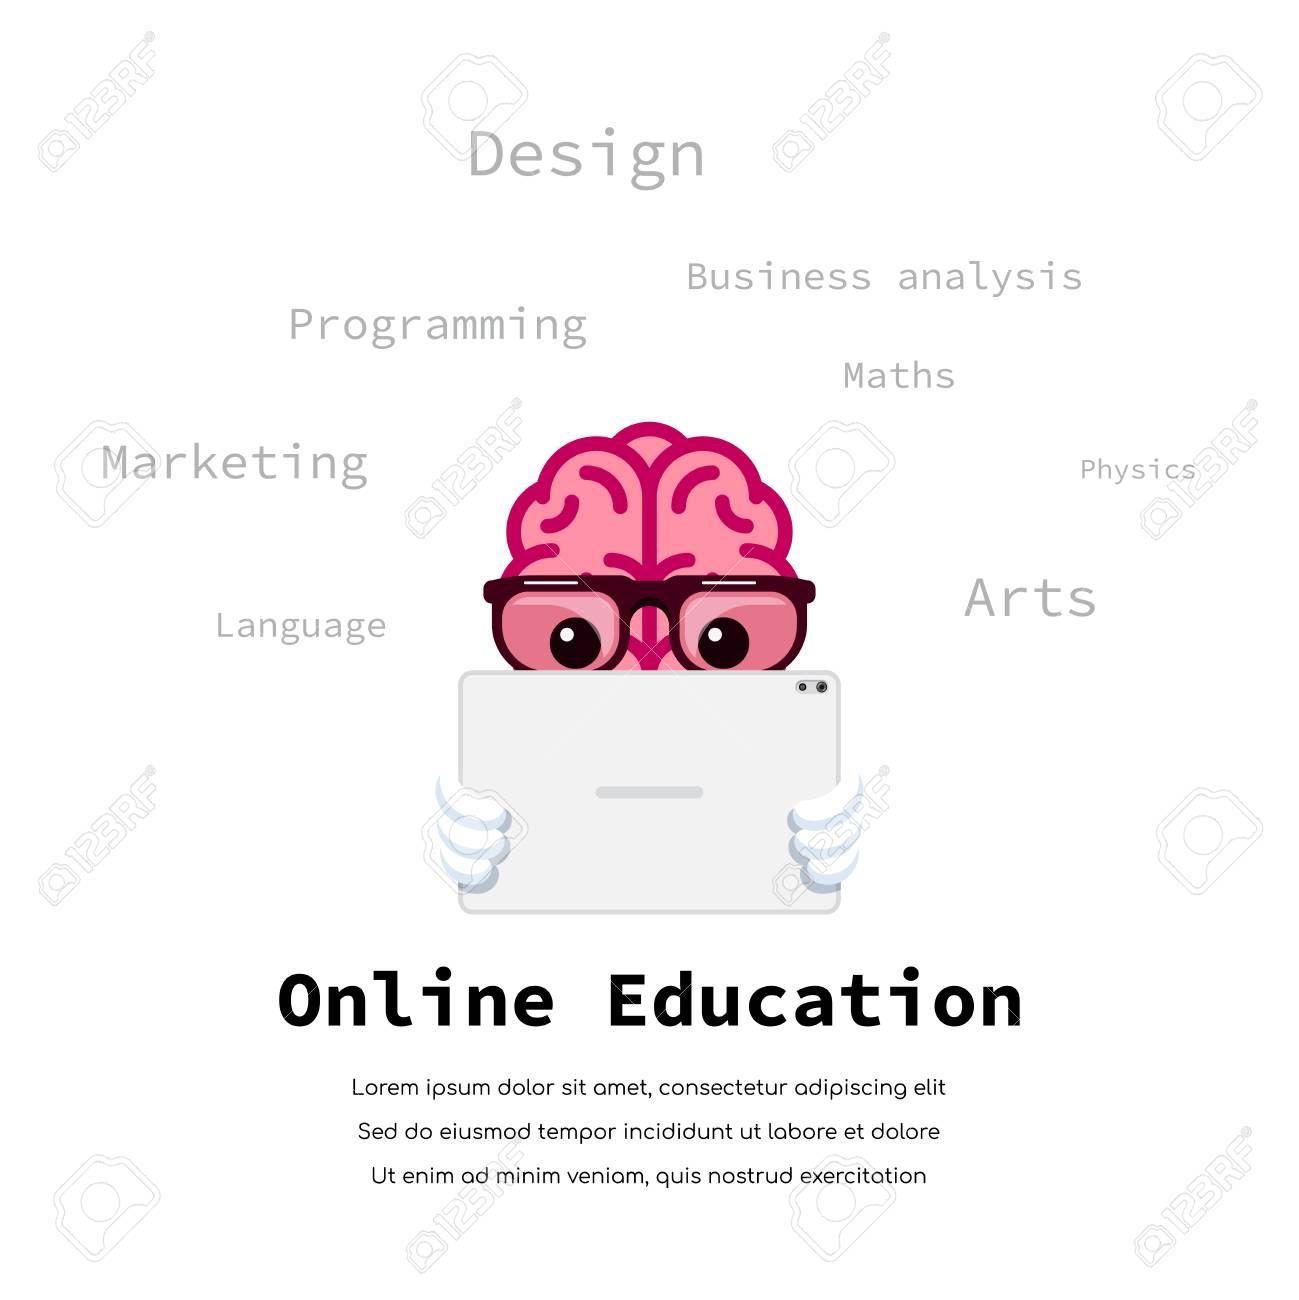 Human brain watching educational video on tablet  Online education